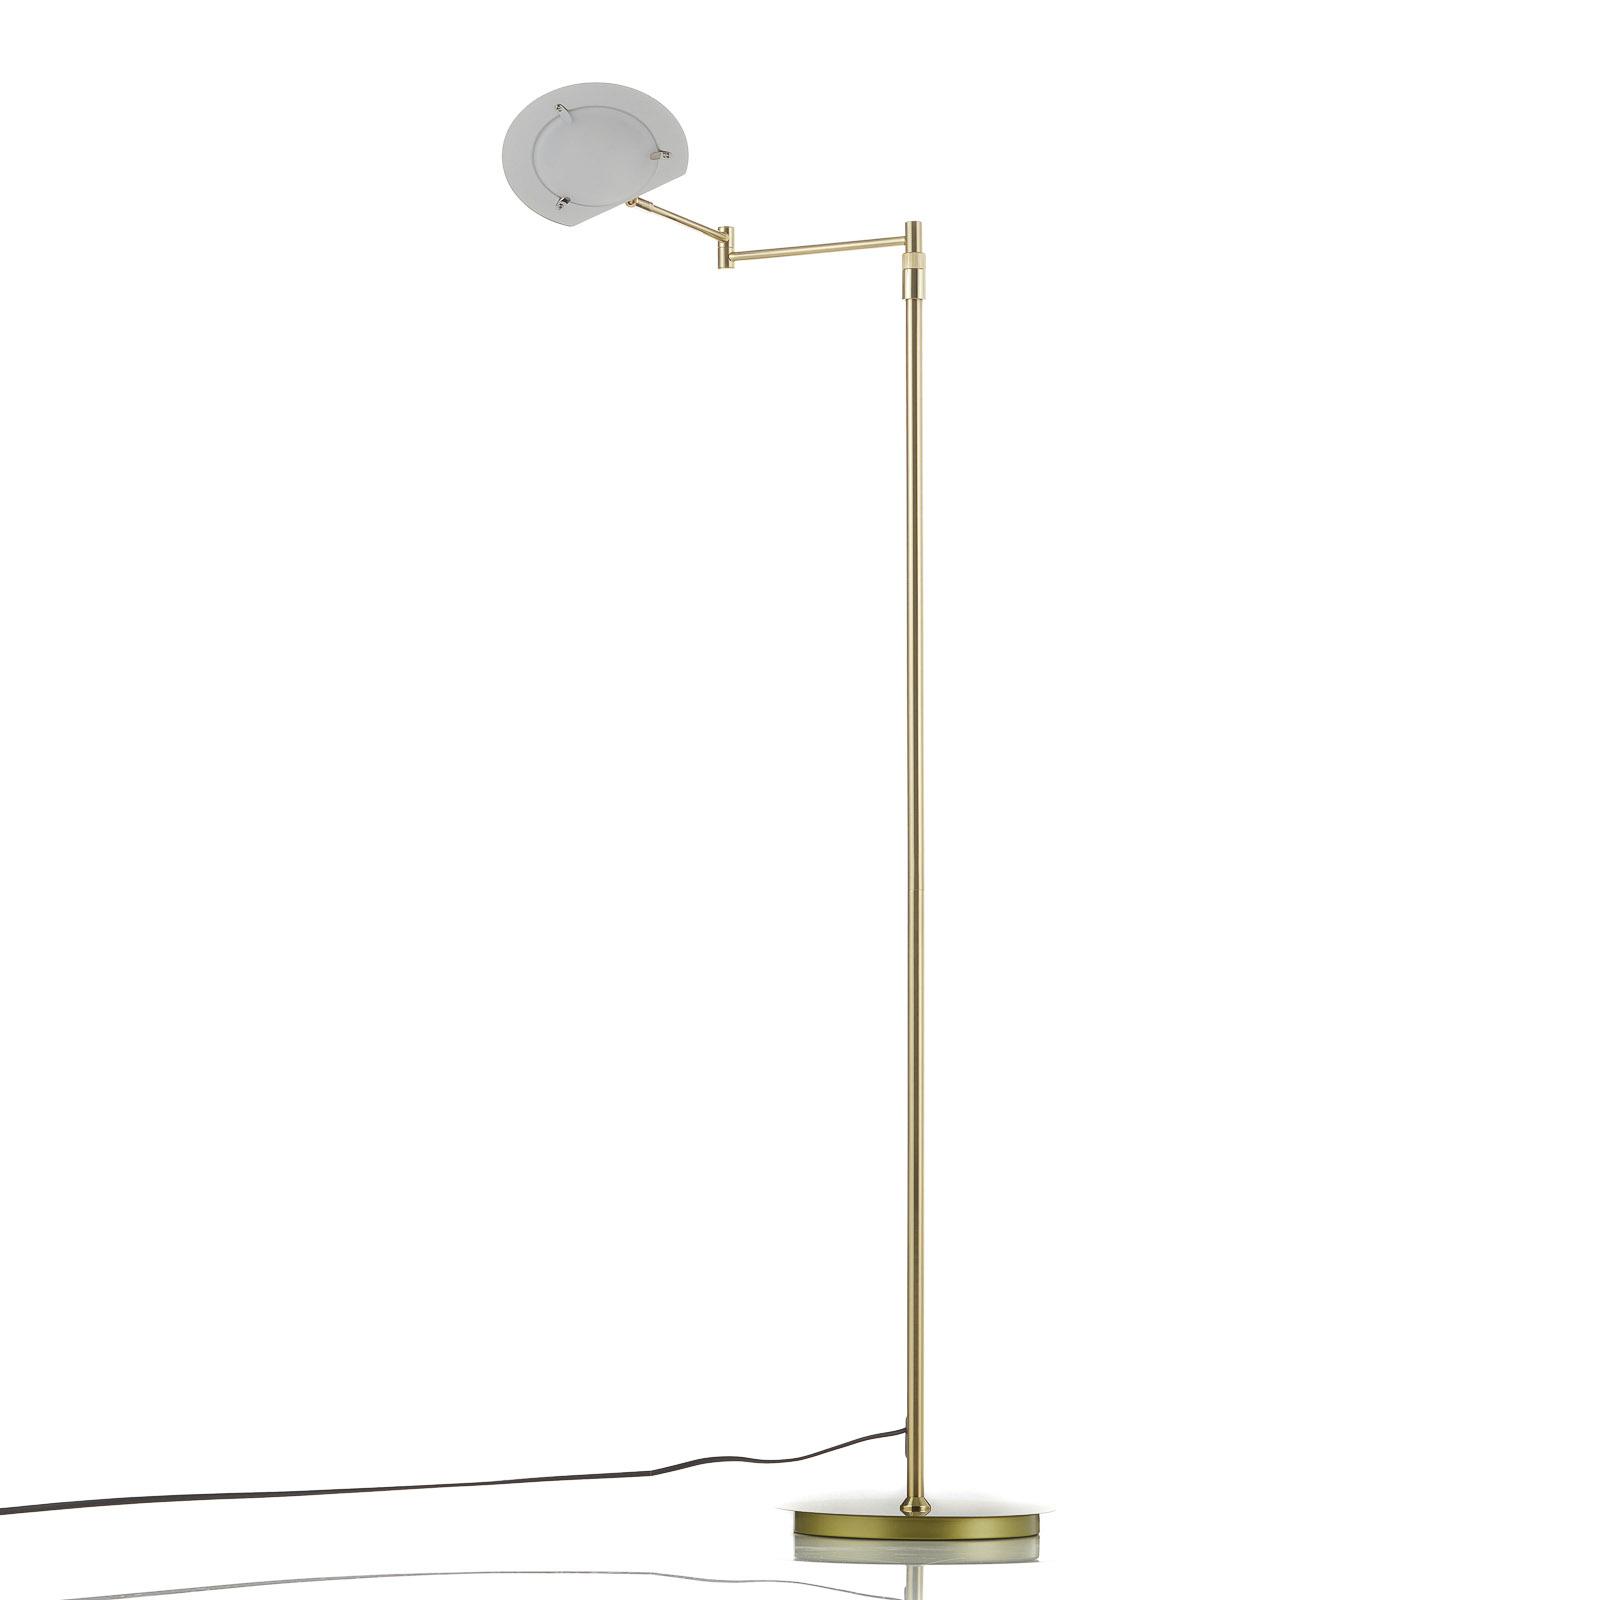 Lampadaire LED Calcio, réglable, laiton mat